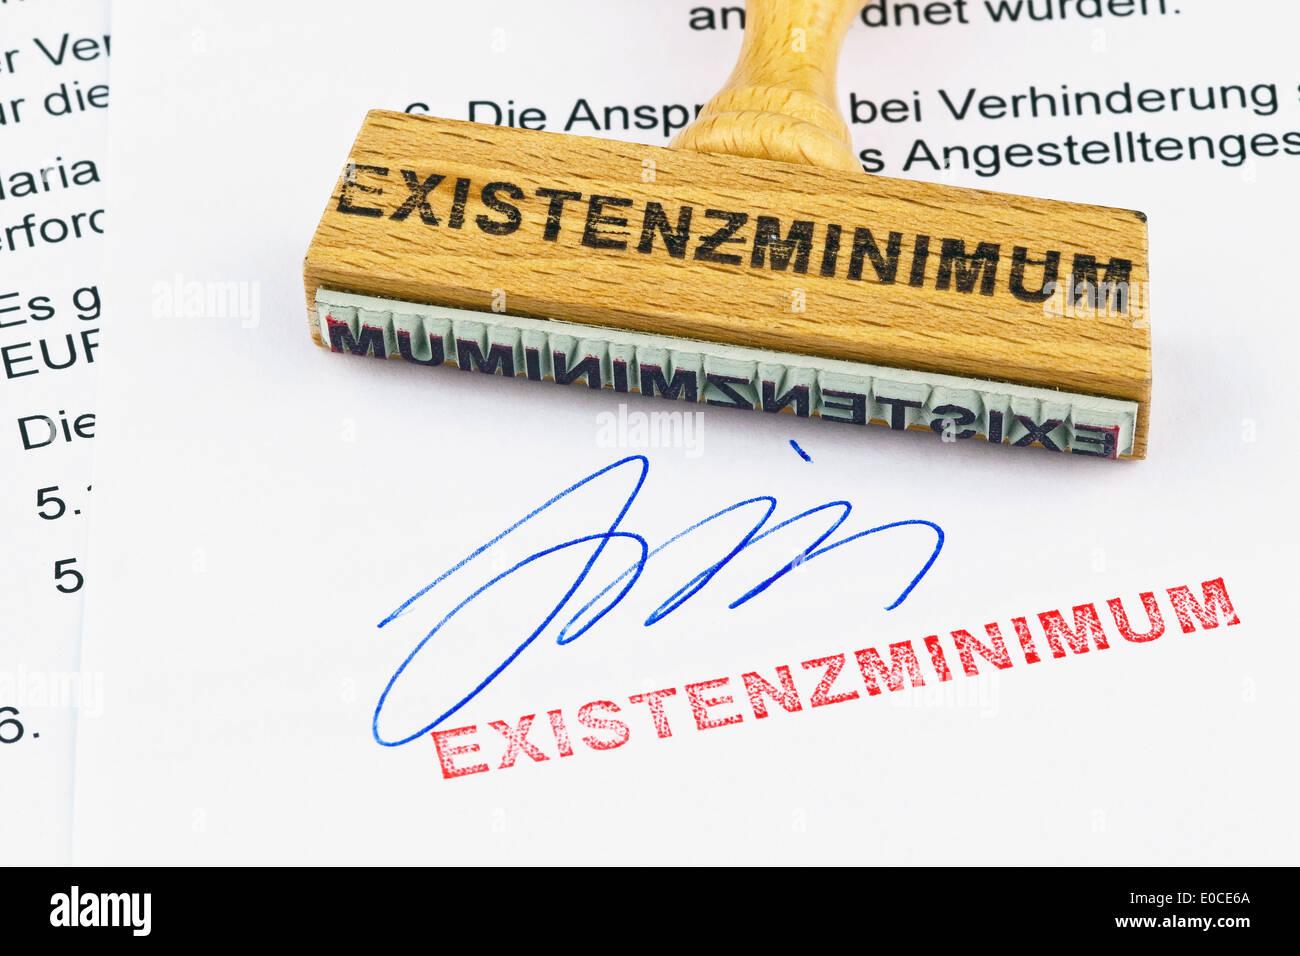 A stamp of wood lies on a document. Label Subsistence level, Ein Stempel aus Holz liegt auf einem Dokument. Aufschrift Existenzm - Stock Image